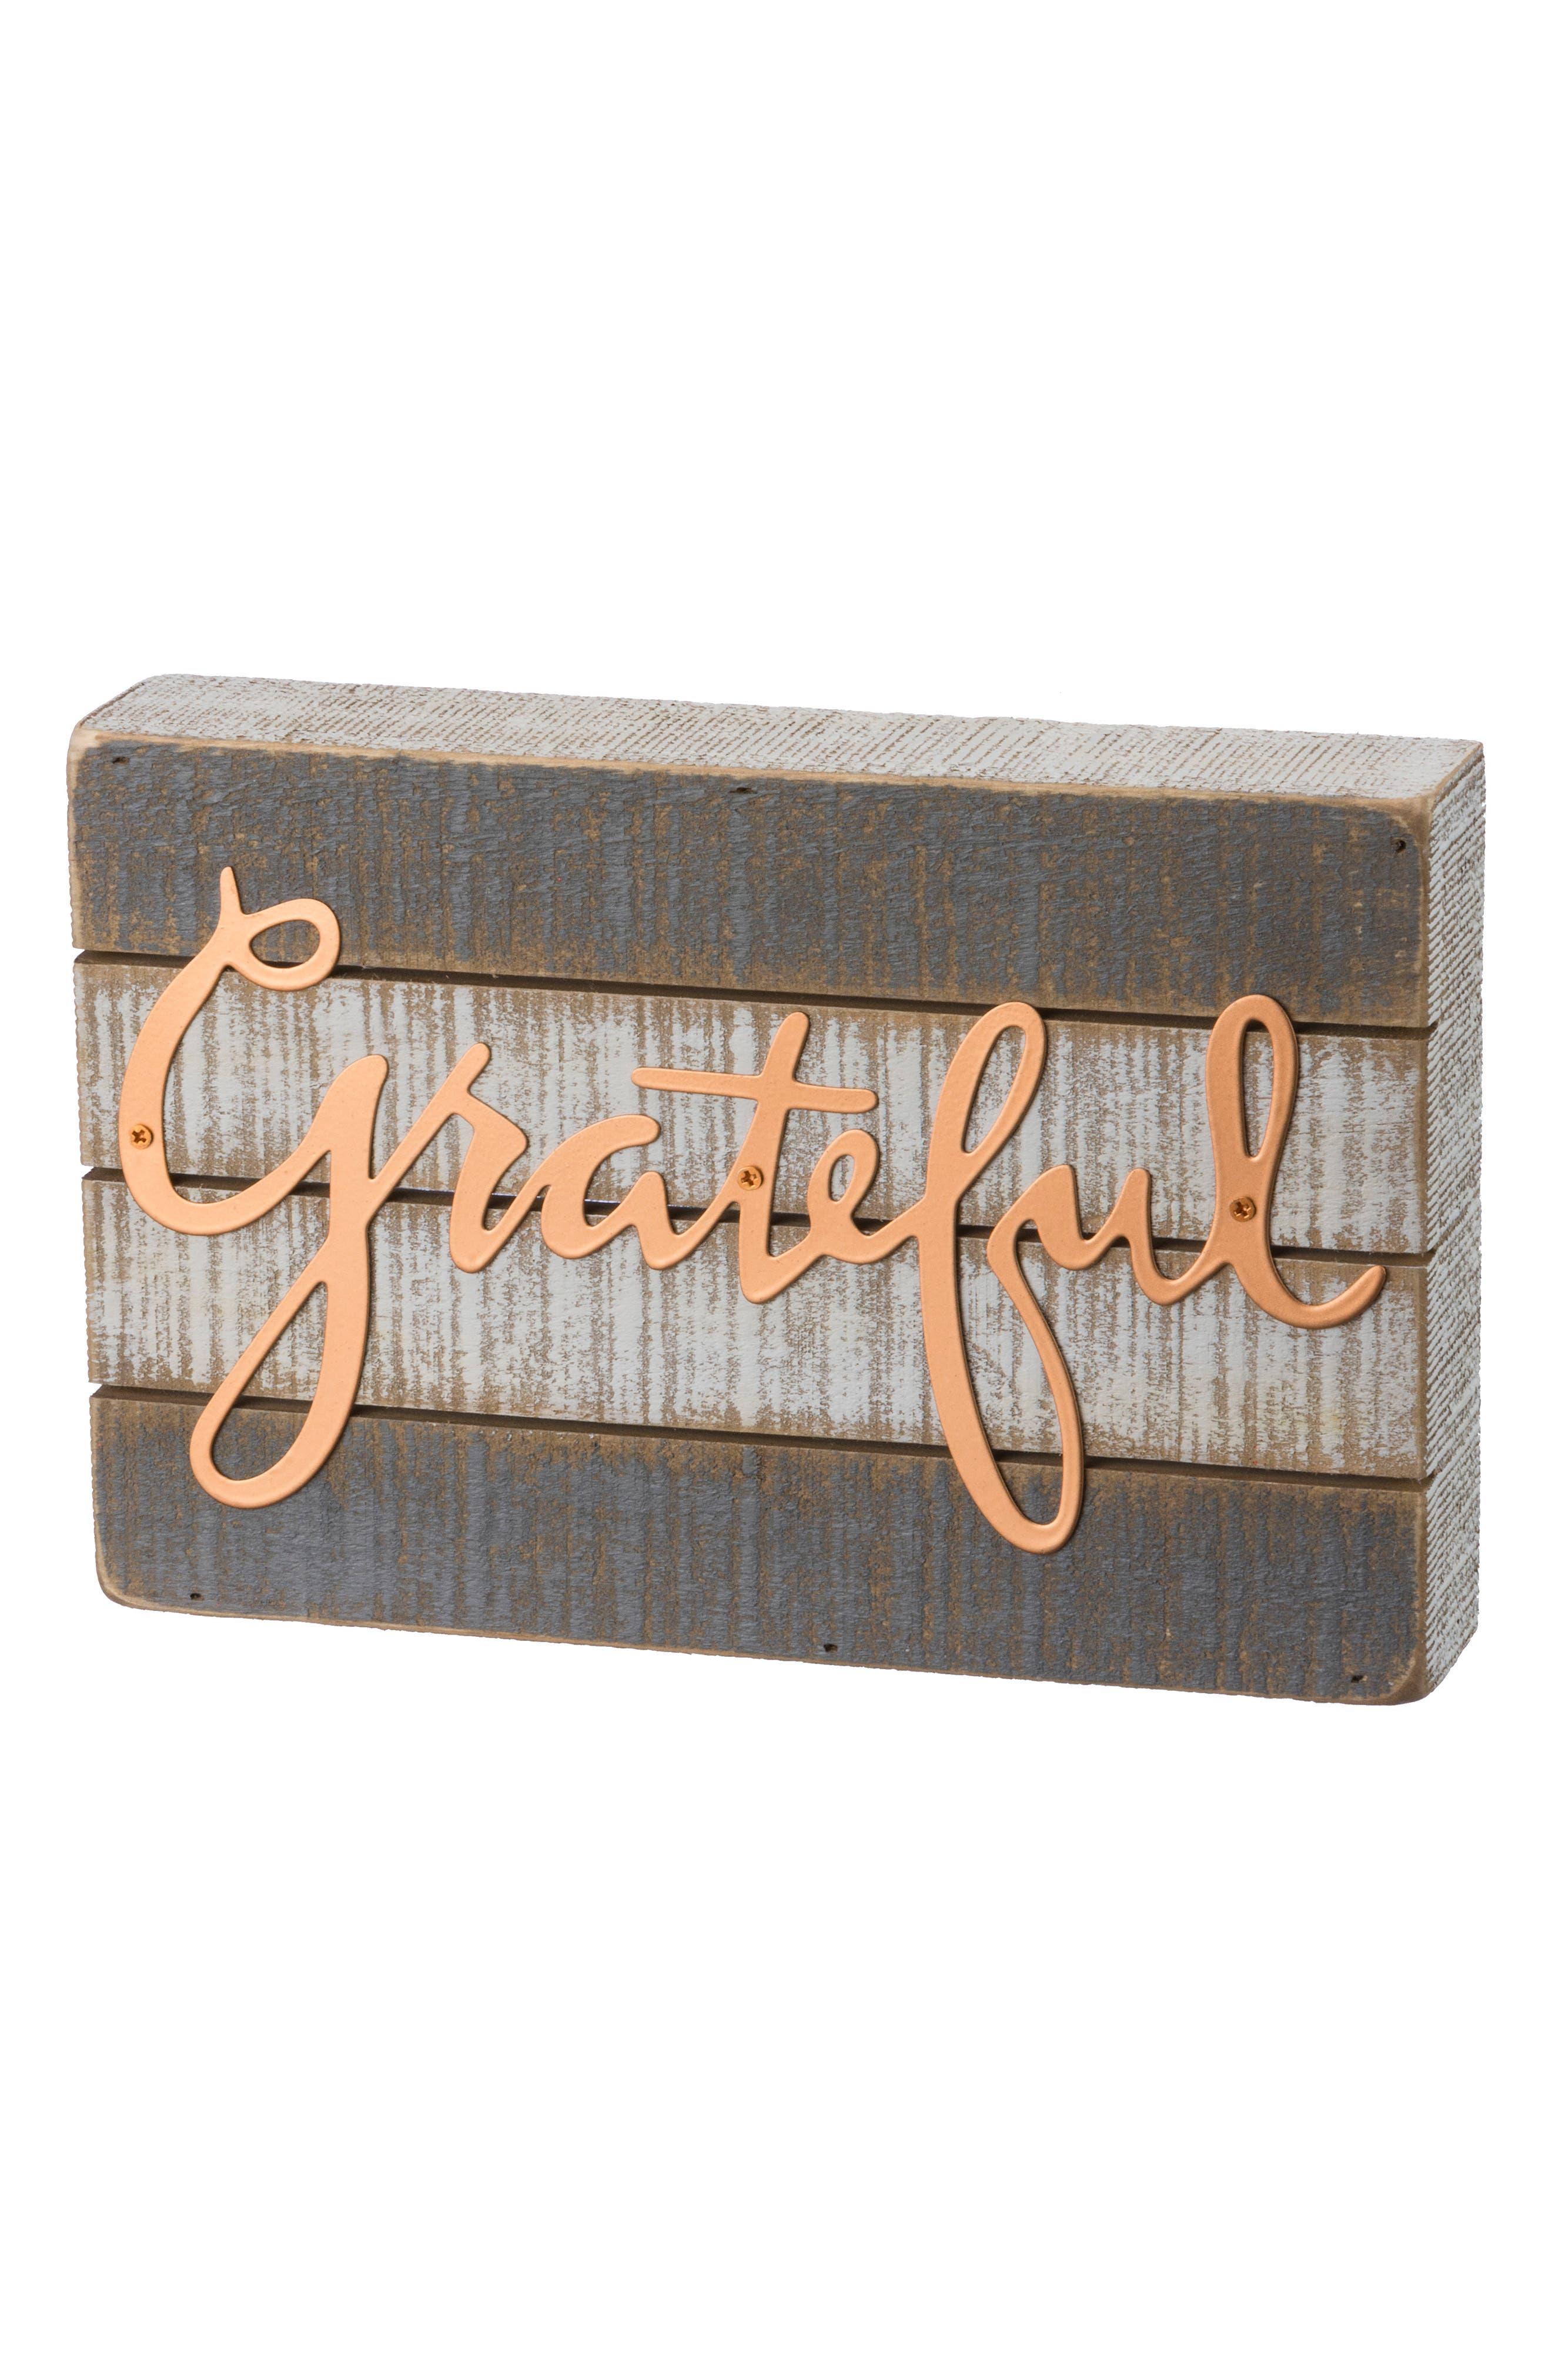 Grateful Wood Box Sign,                             Main thumbnail 1, color,